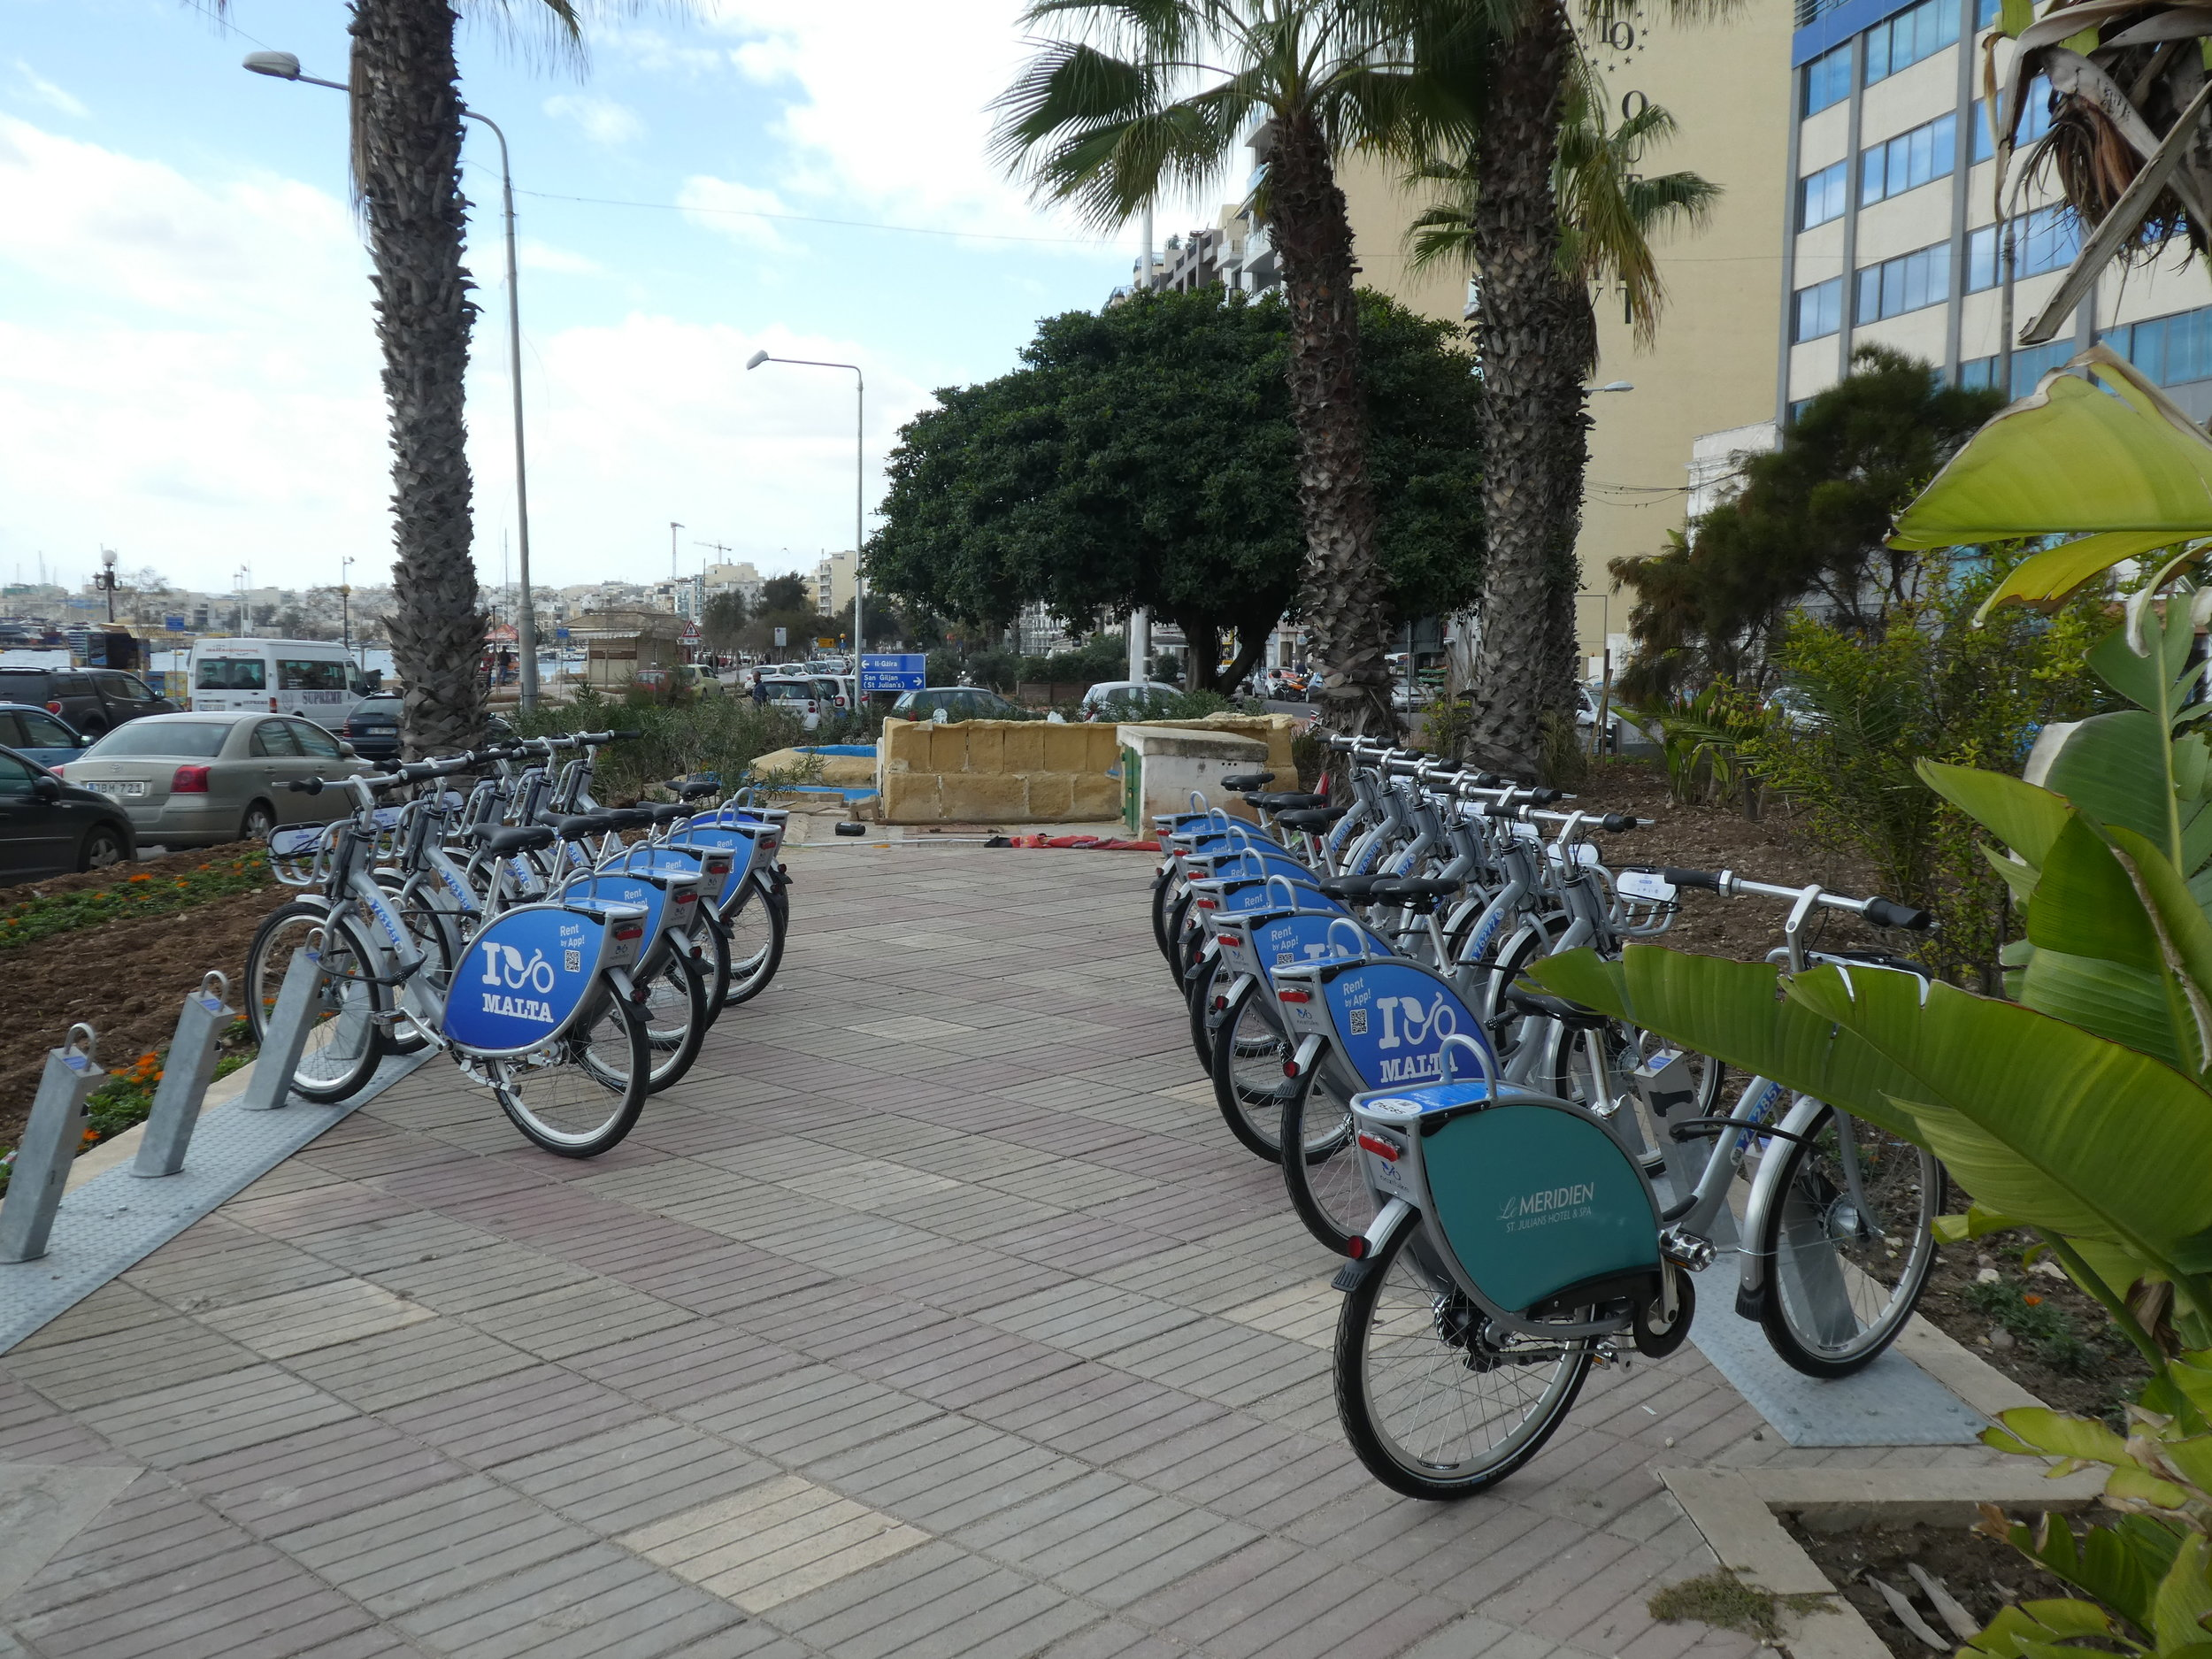 Nextbike station in Sliema, opposite the ferry pier.